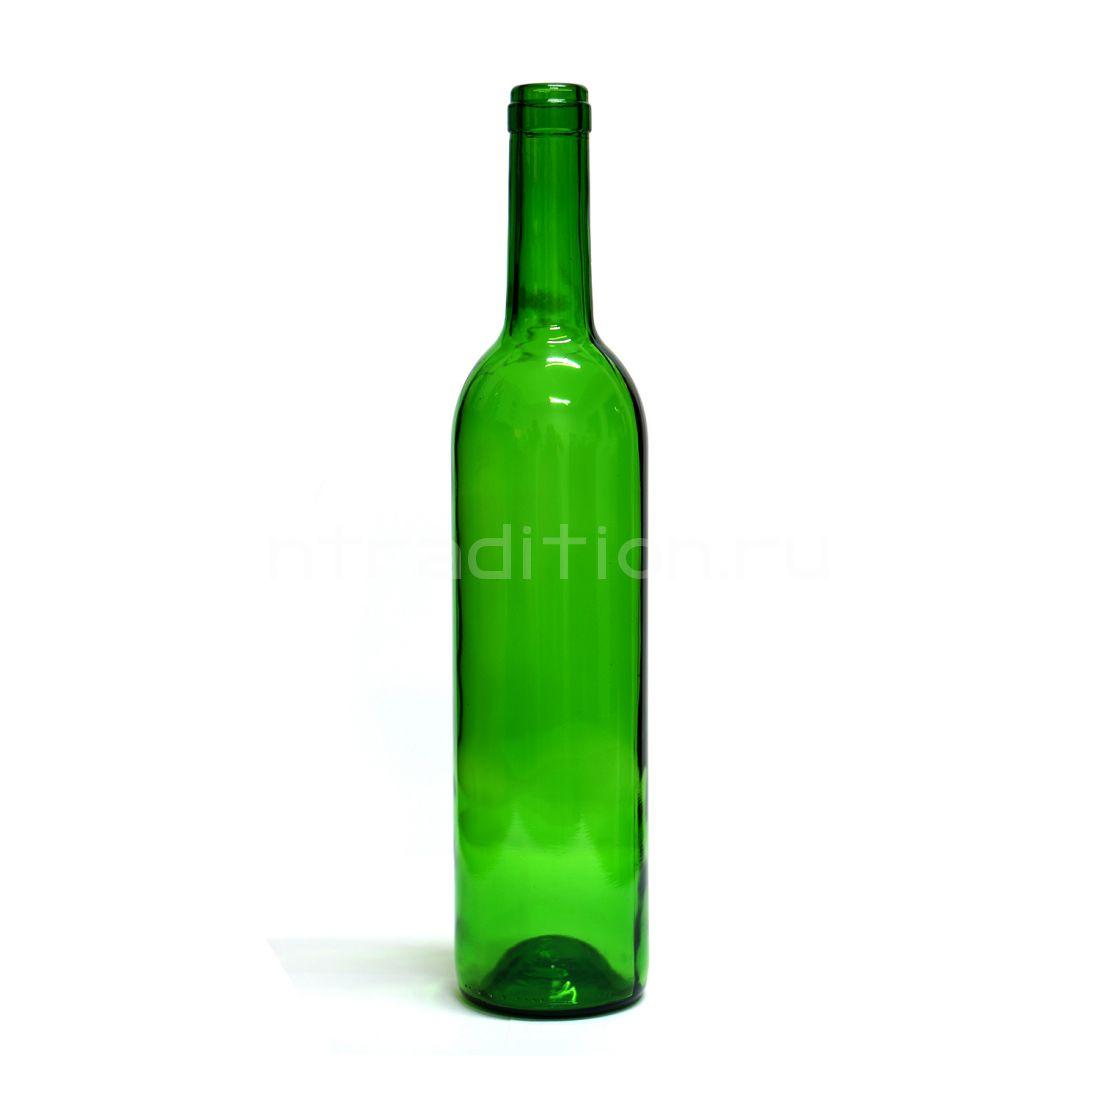 Винная бутылка Бордо (цвет зеленый) 0,7 л. / 16 шт.